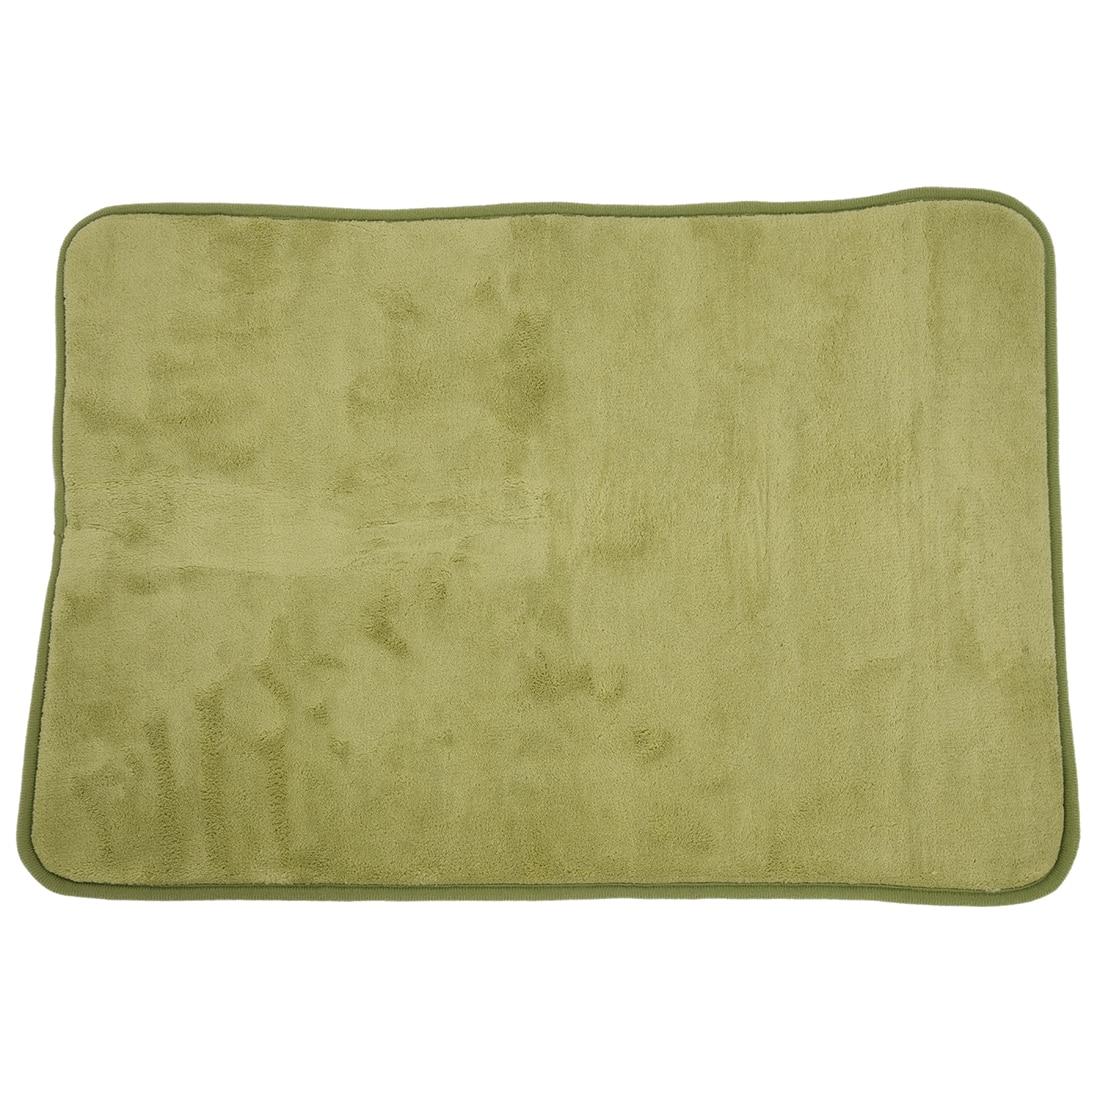 by home green bath popcorn mats rug amazon m kitchen dp fashions j sage inch mat com